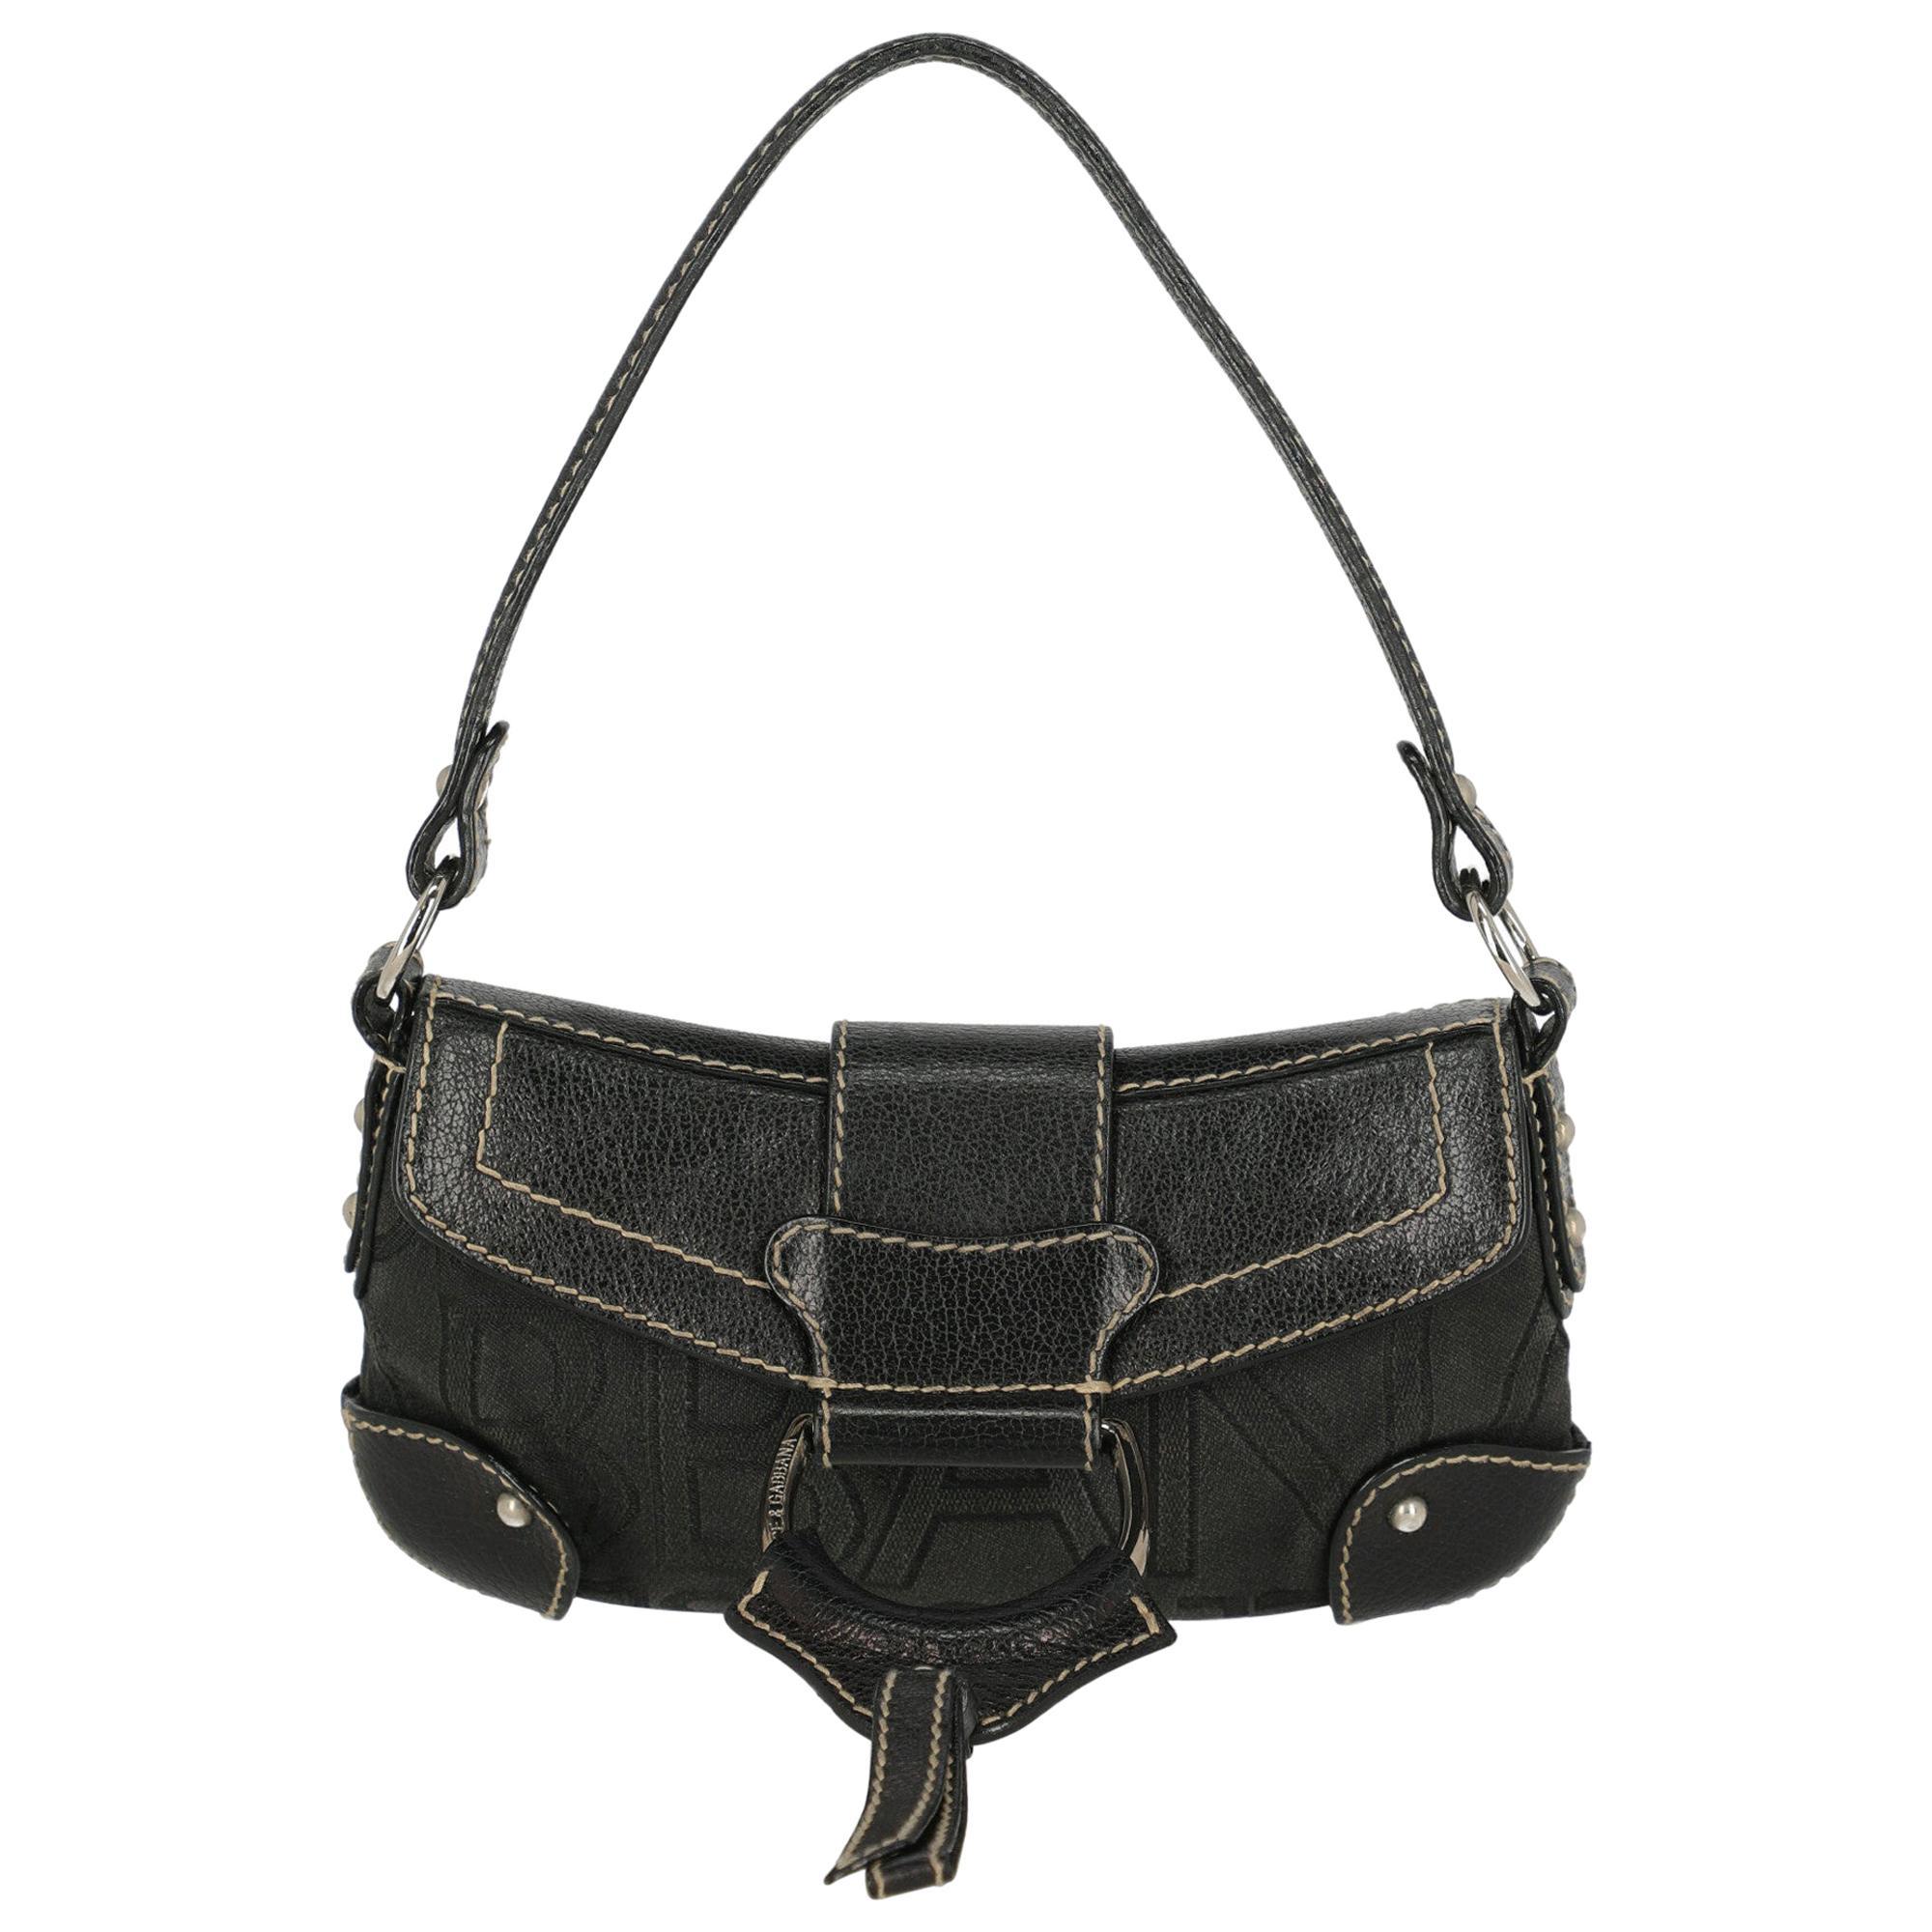 Dolce & Gabbana Woman Handbag Black Leather